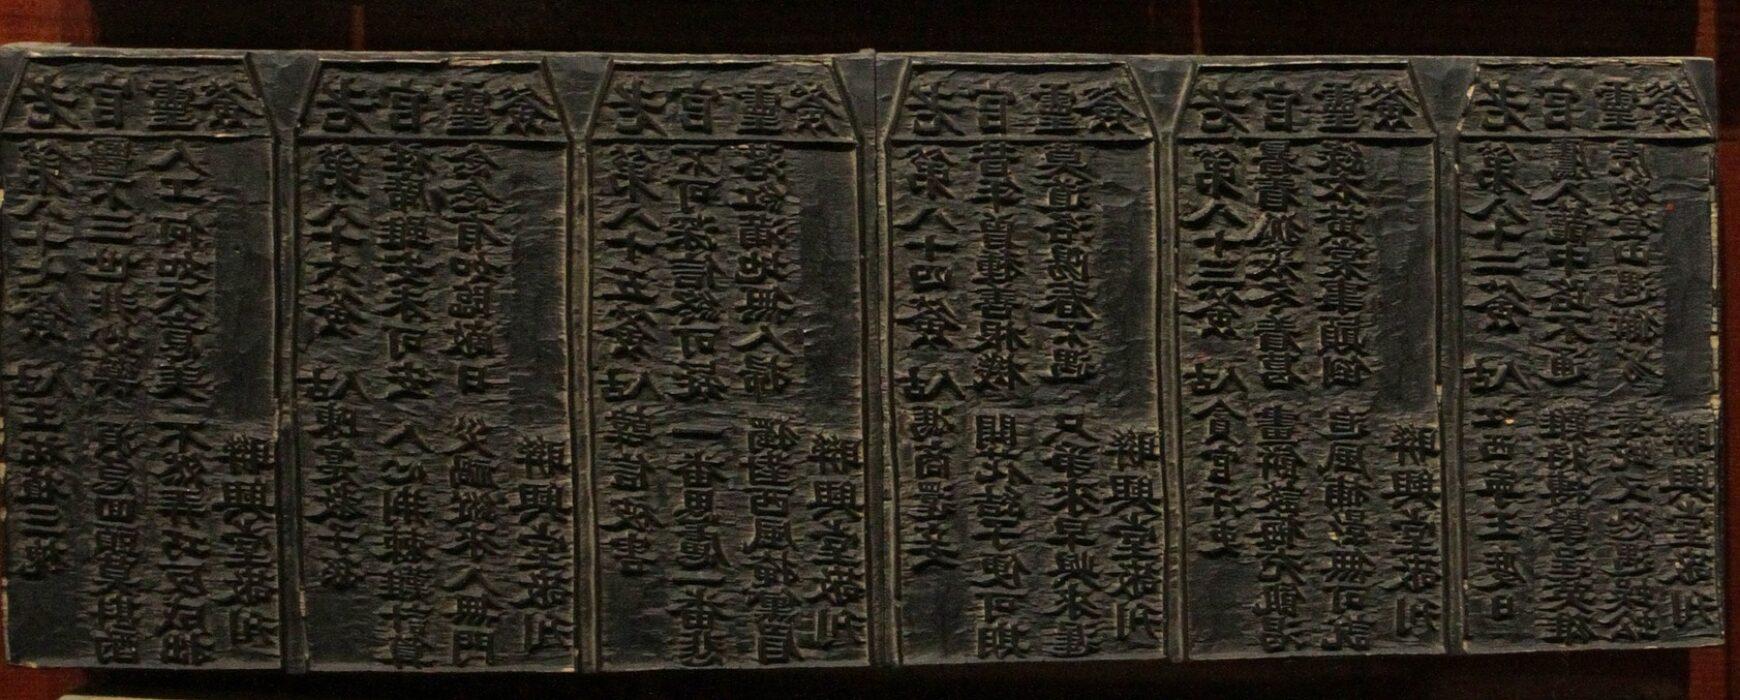 East Asian Manuscript and Print as Harbingers of the Digital Future